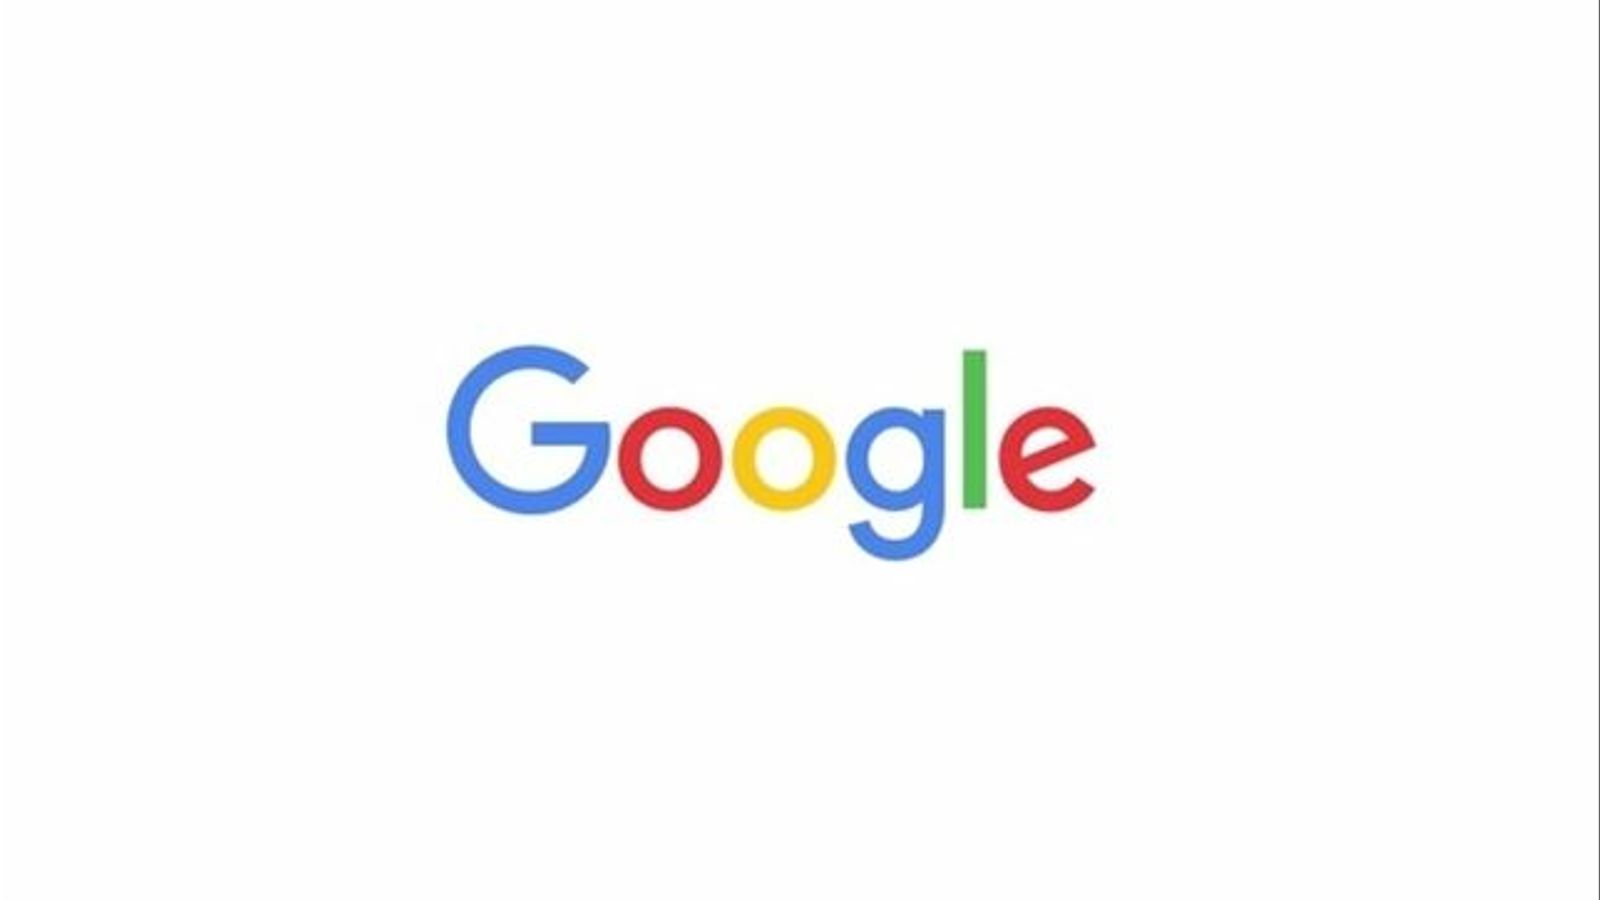 Google estrena logo